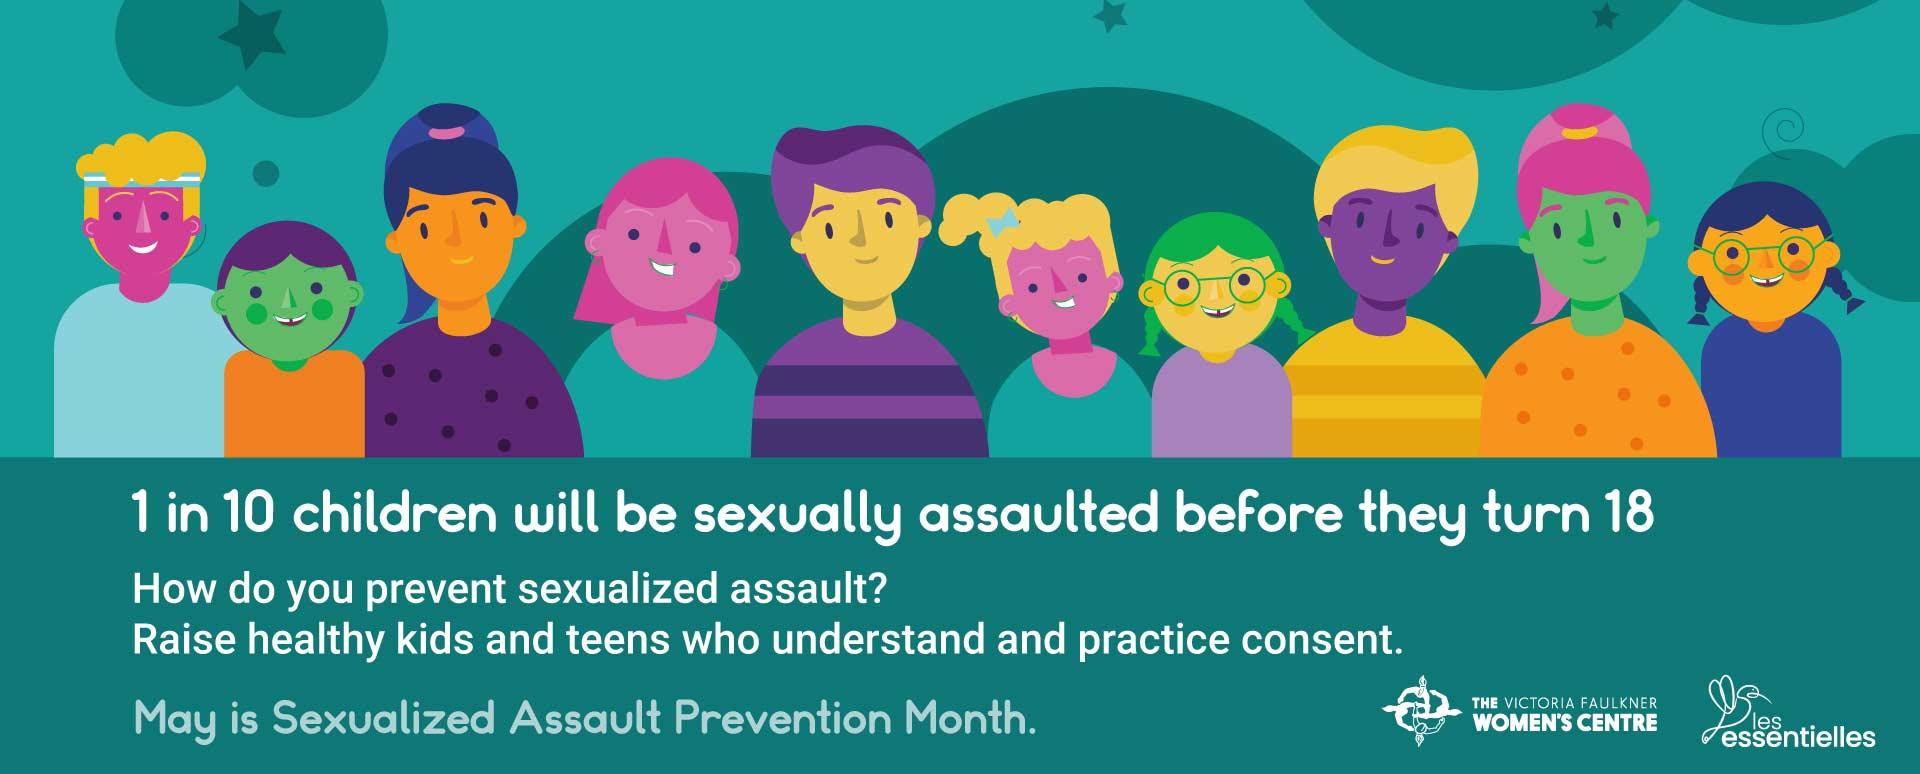 yukon sexual assault prevention month banner